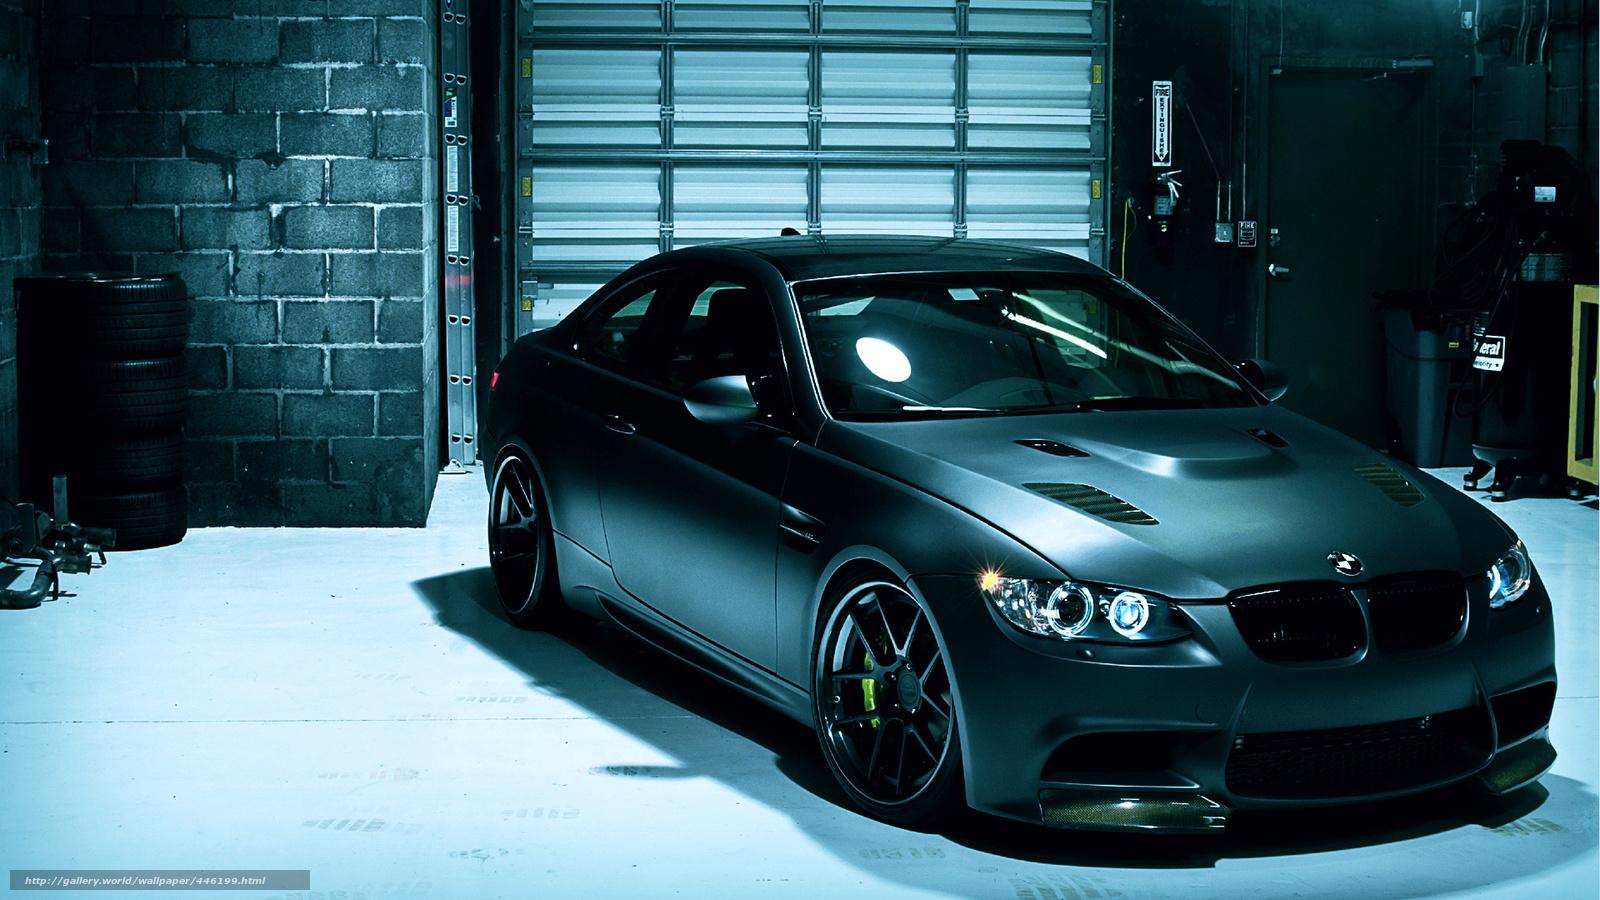 Tlcharger fond d 39 ecran voiture garage bmw voitures for Garage pour bmw